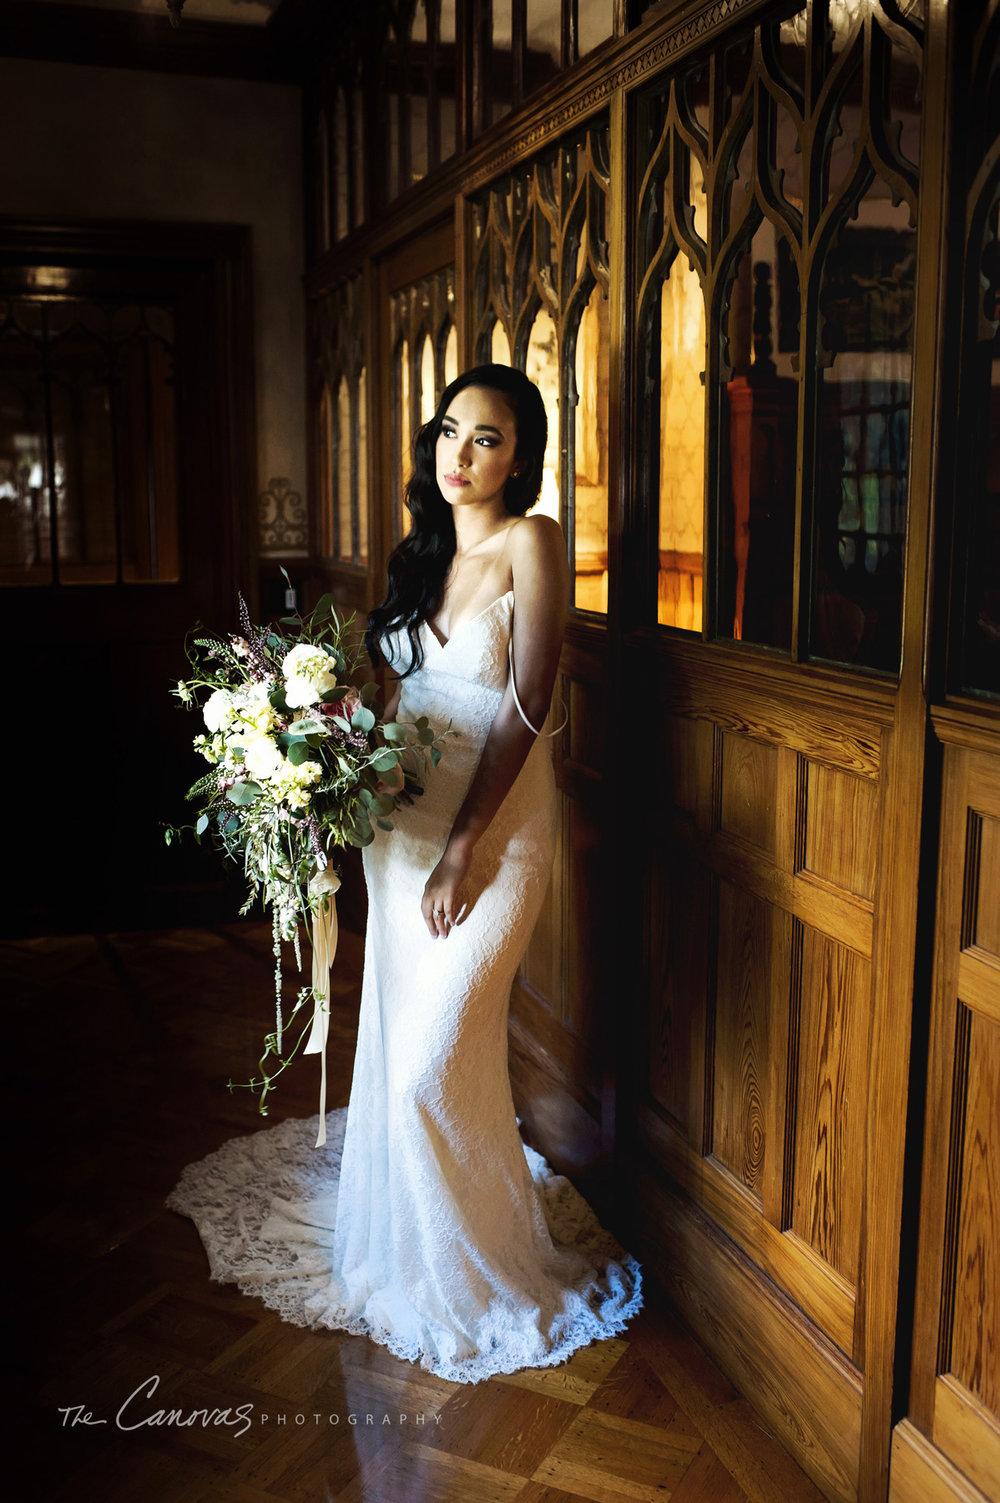 430_Stetson_DeLand_wedding_The_Canovas_Photography.jpg